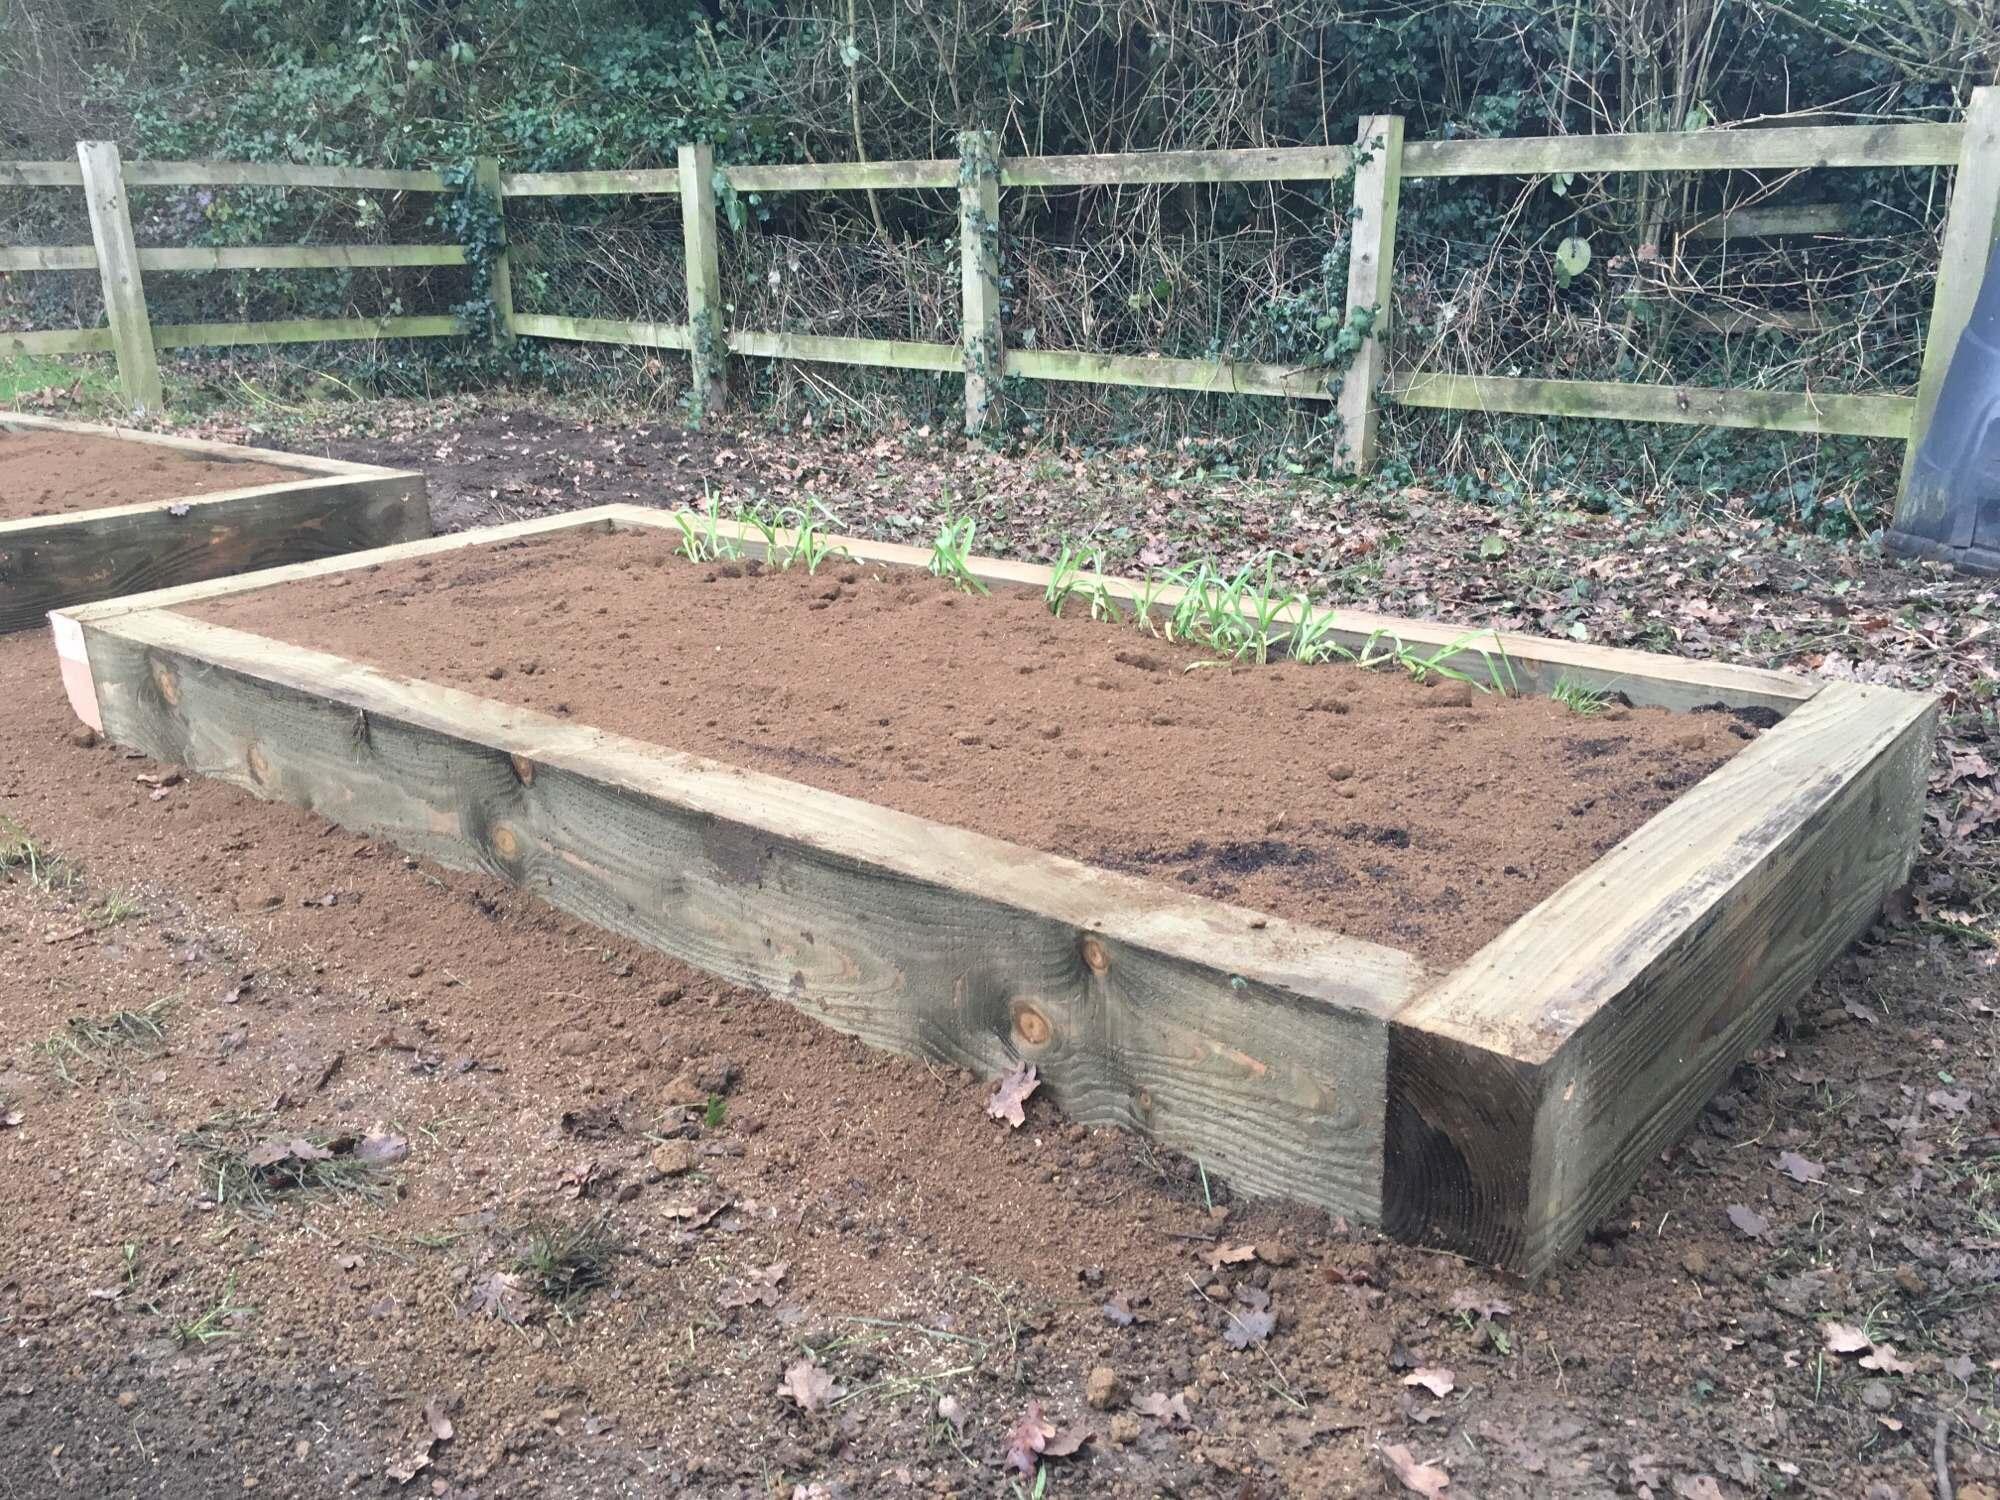 Deddington Primary School Vegetable Garden